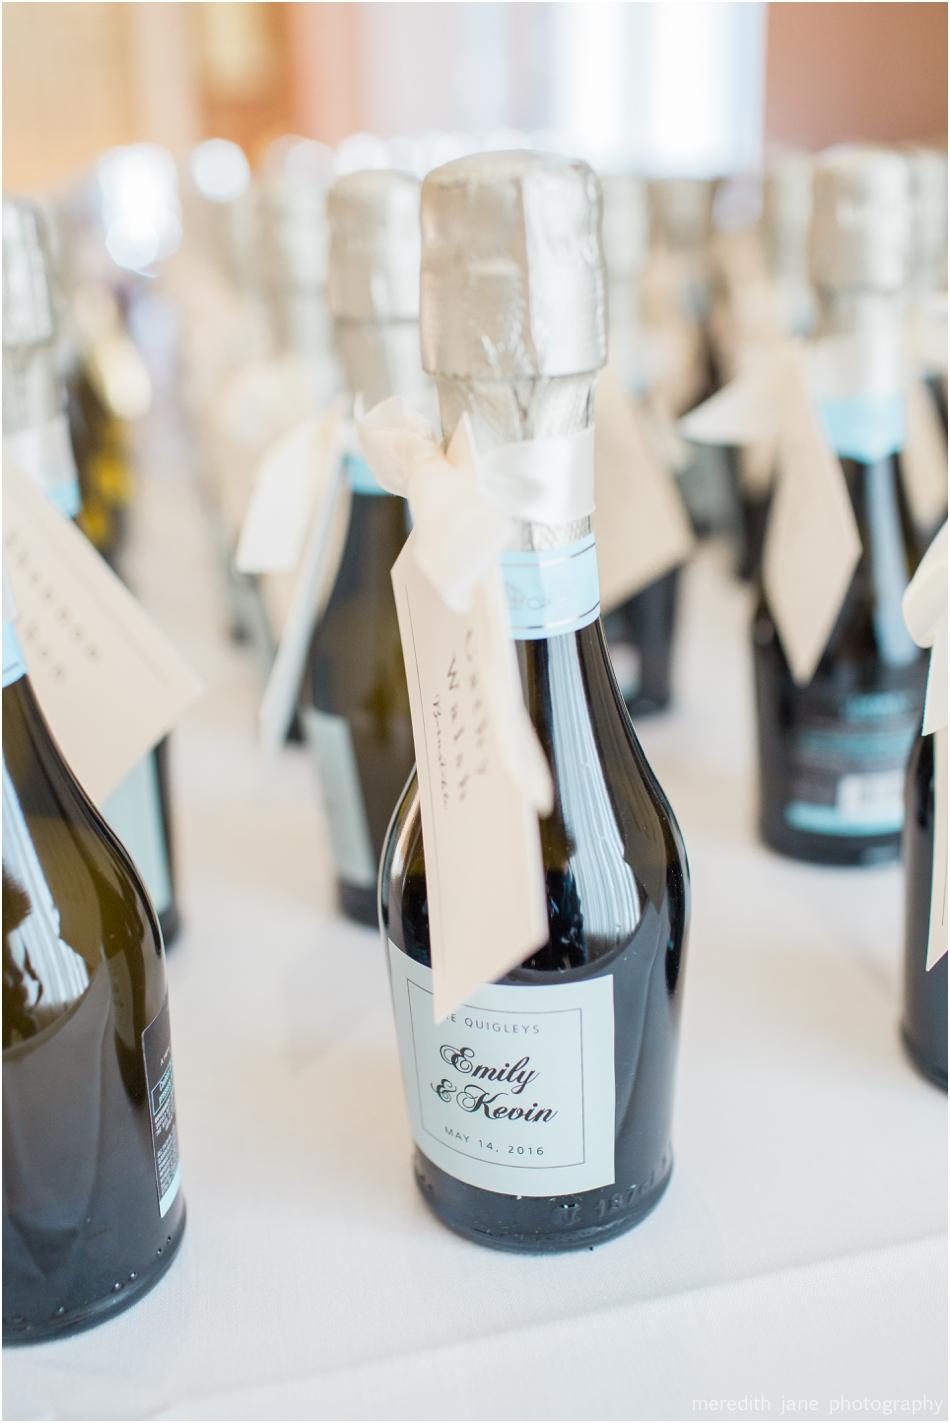 ocean-edge-resort-champagne-boston-cape-cod-wedding-photographer-photo_0061